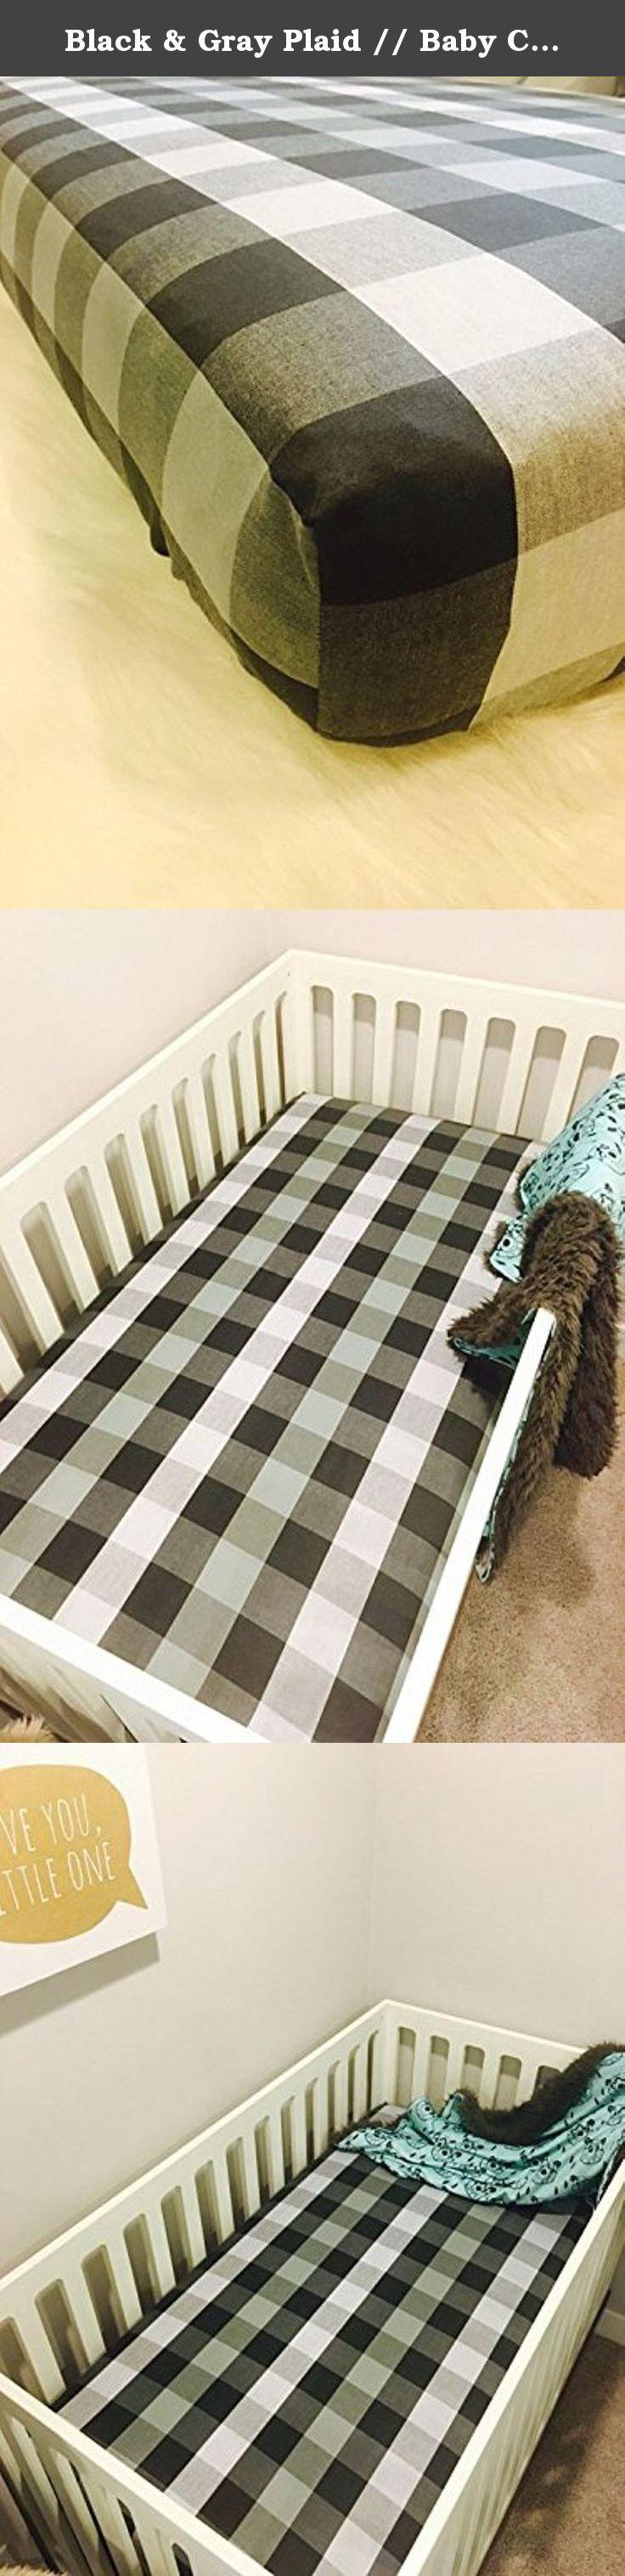 Baby crib mattress frame - Black Gray Plaid Baby Crib Sheet Baby Bedding Our Sheets